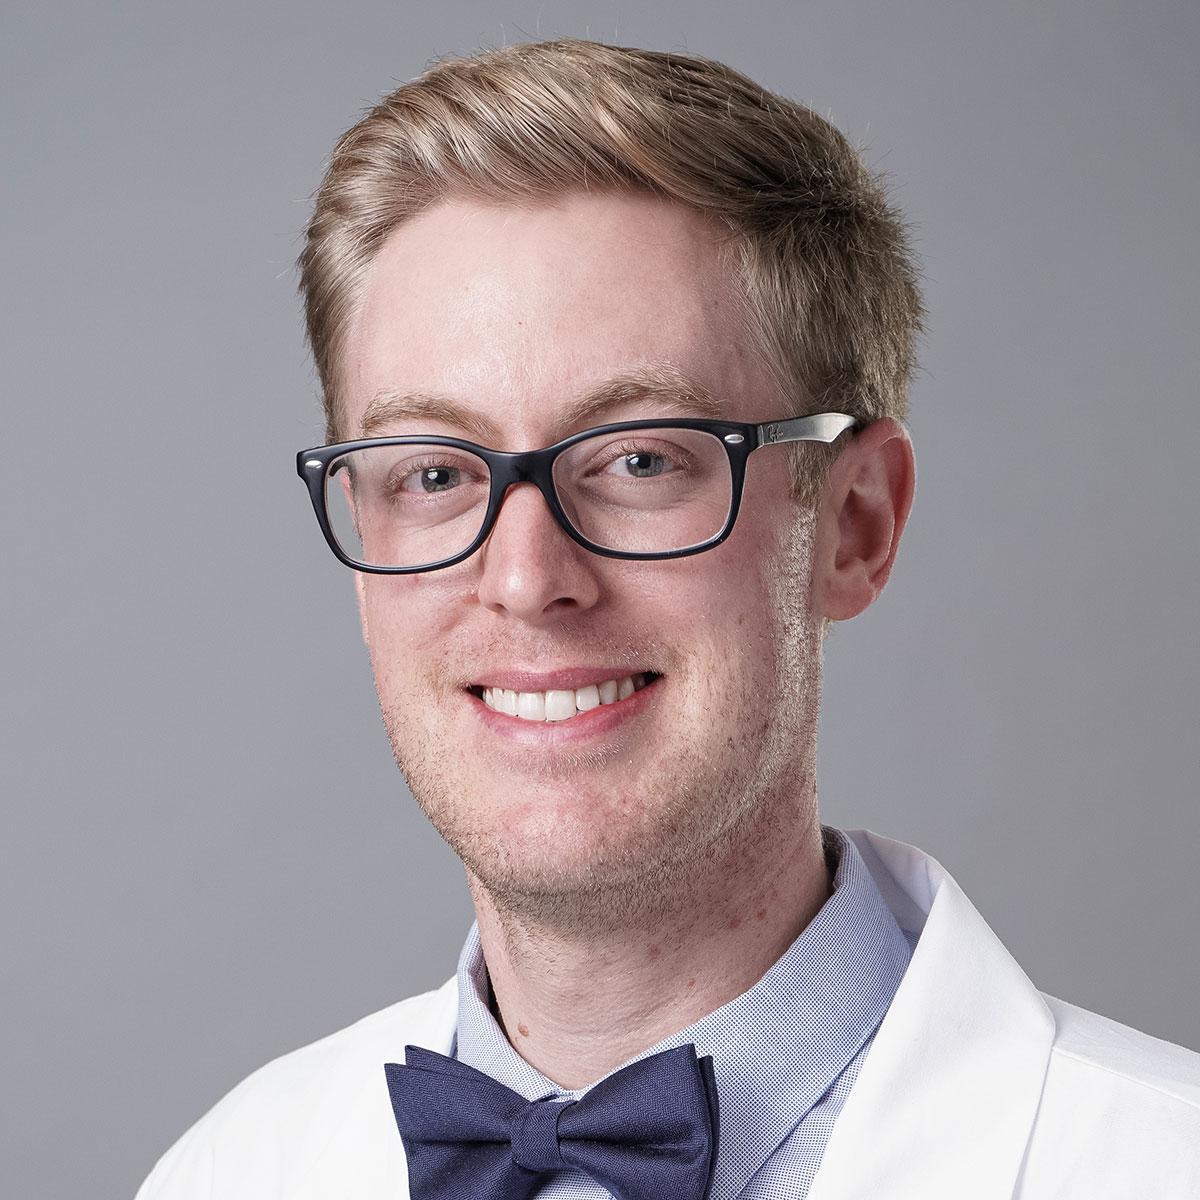 A friendly headshot of Dr. Lucas Hopkins